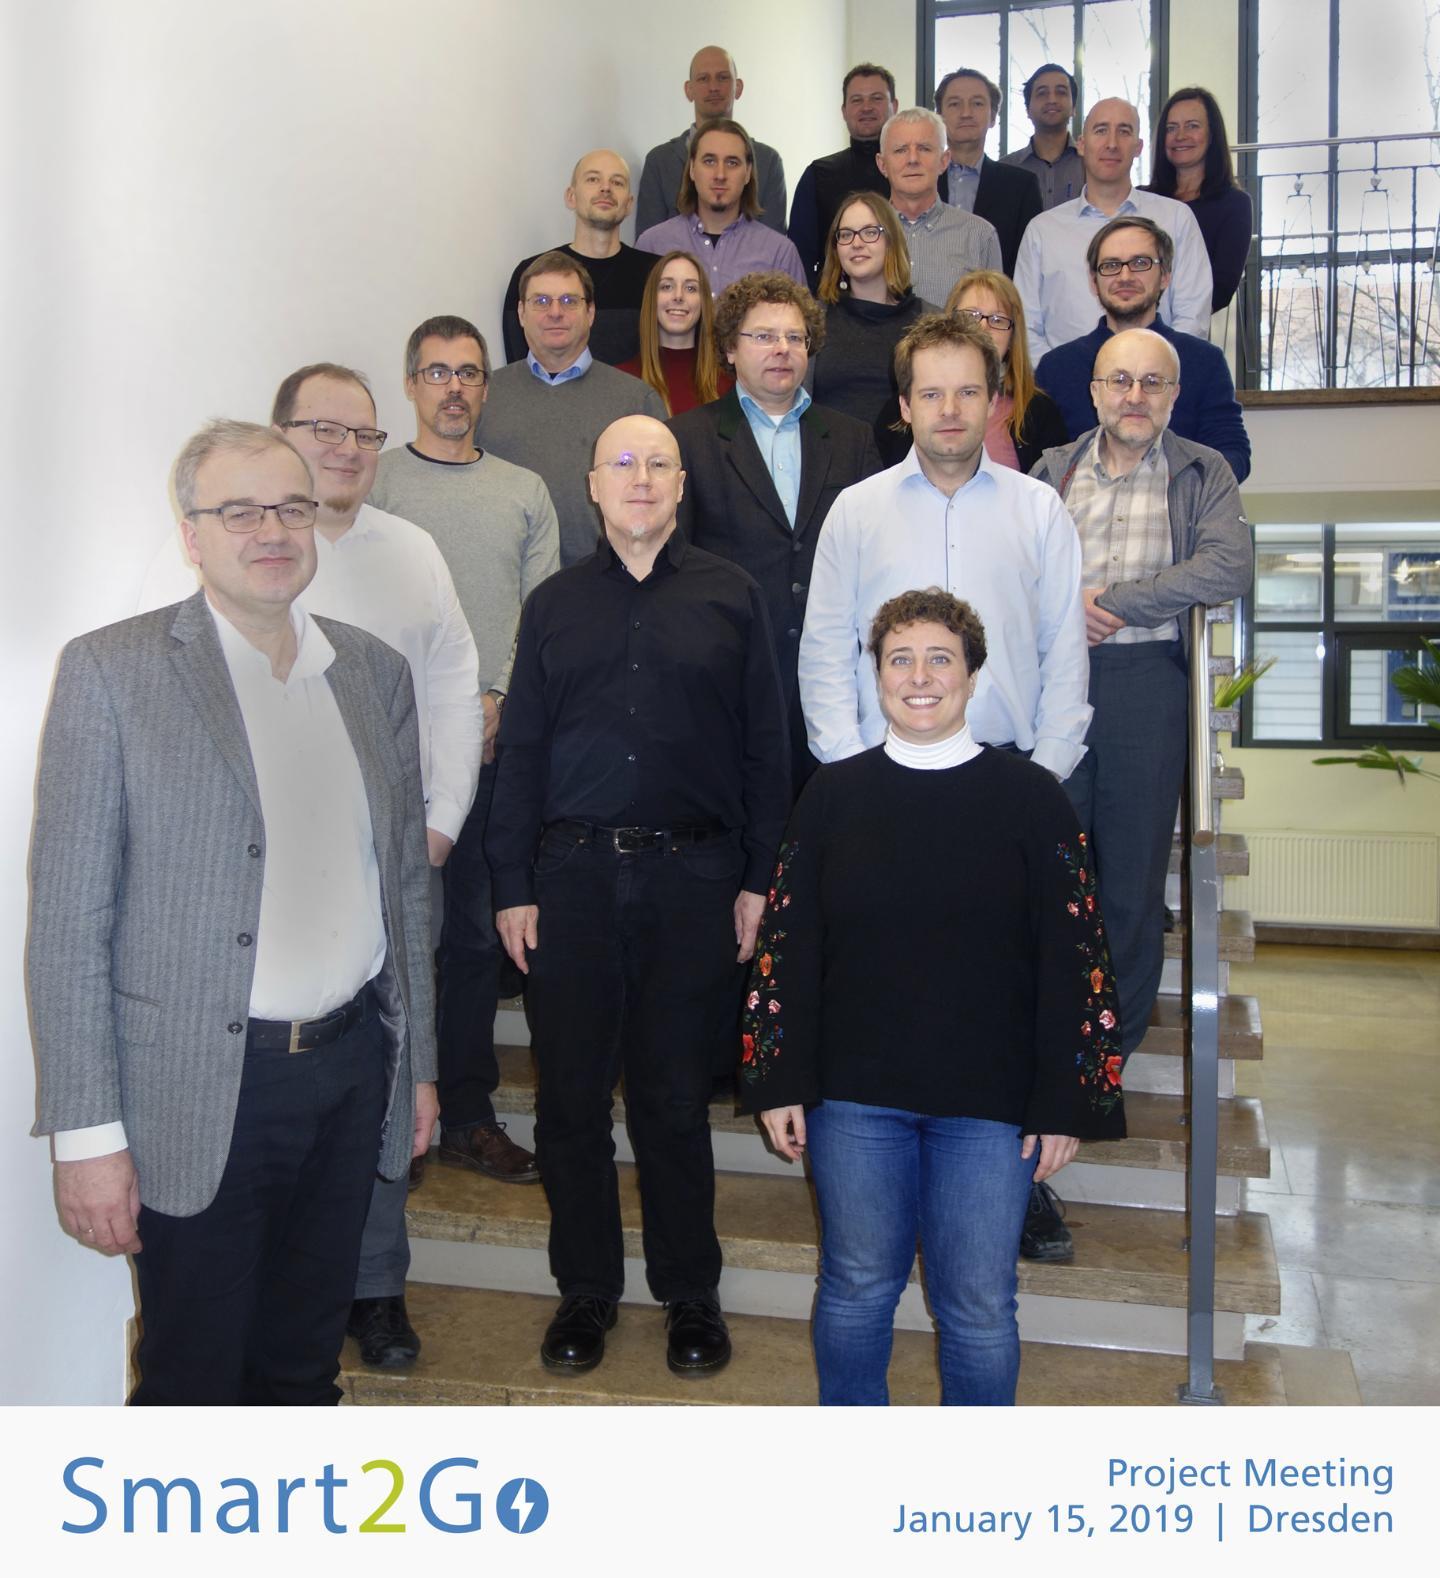 Smart2Go_Group photo-1440x1578.jpg